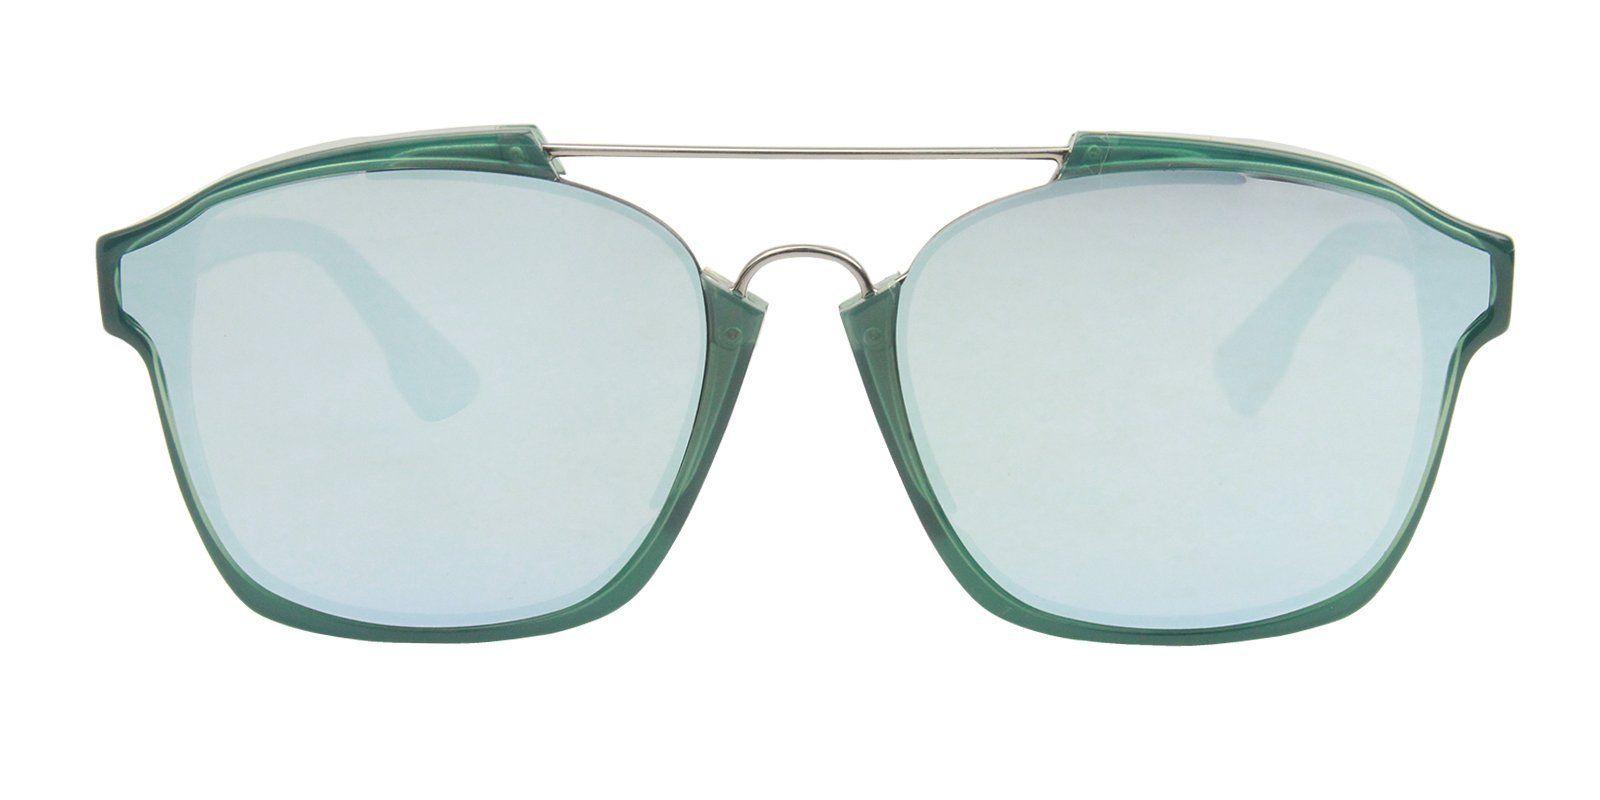 e5762d3902 Dior - Abstract Green - Blue sunglasses